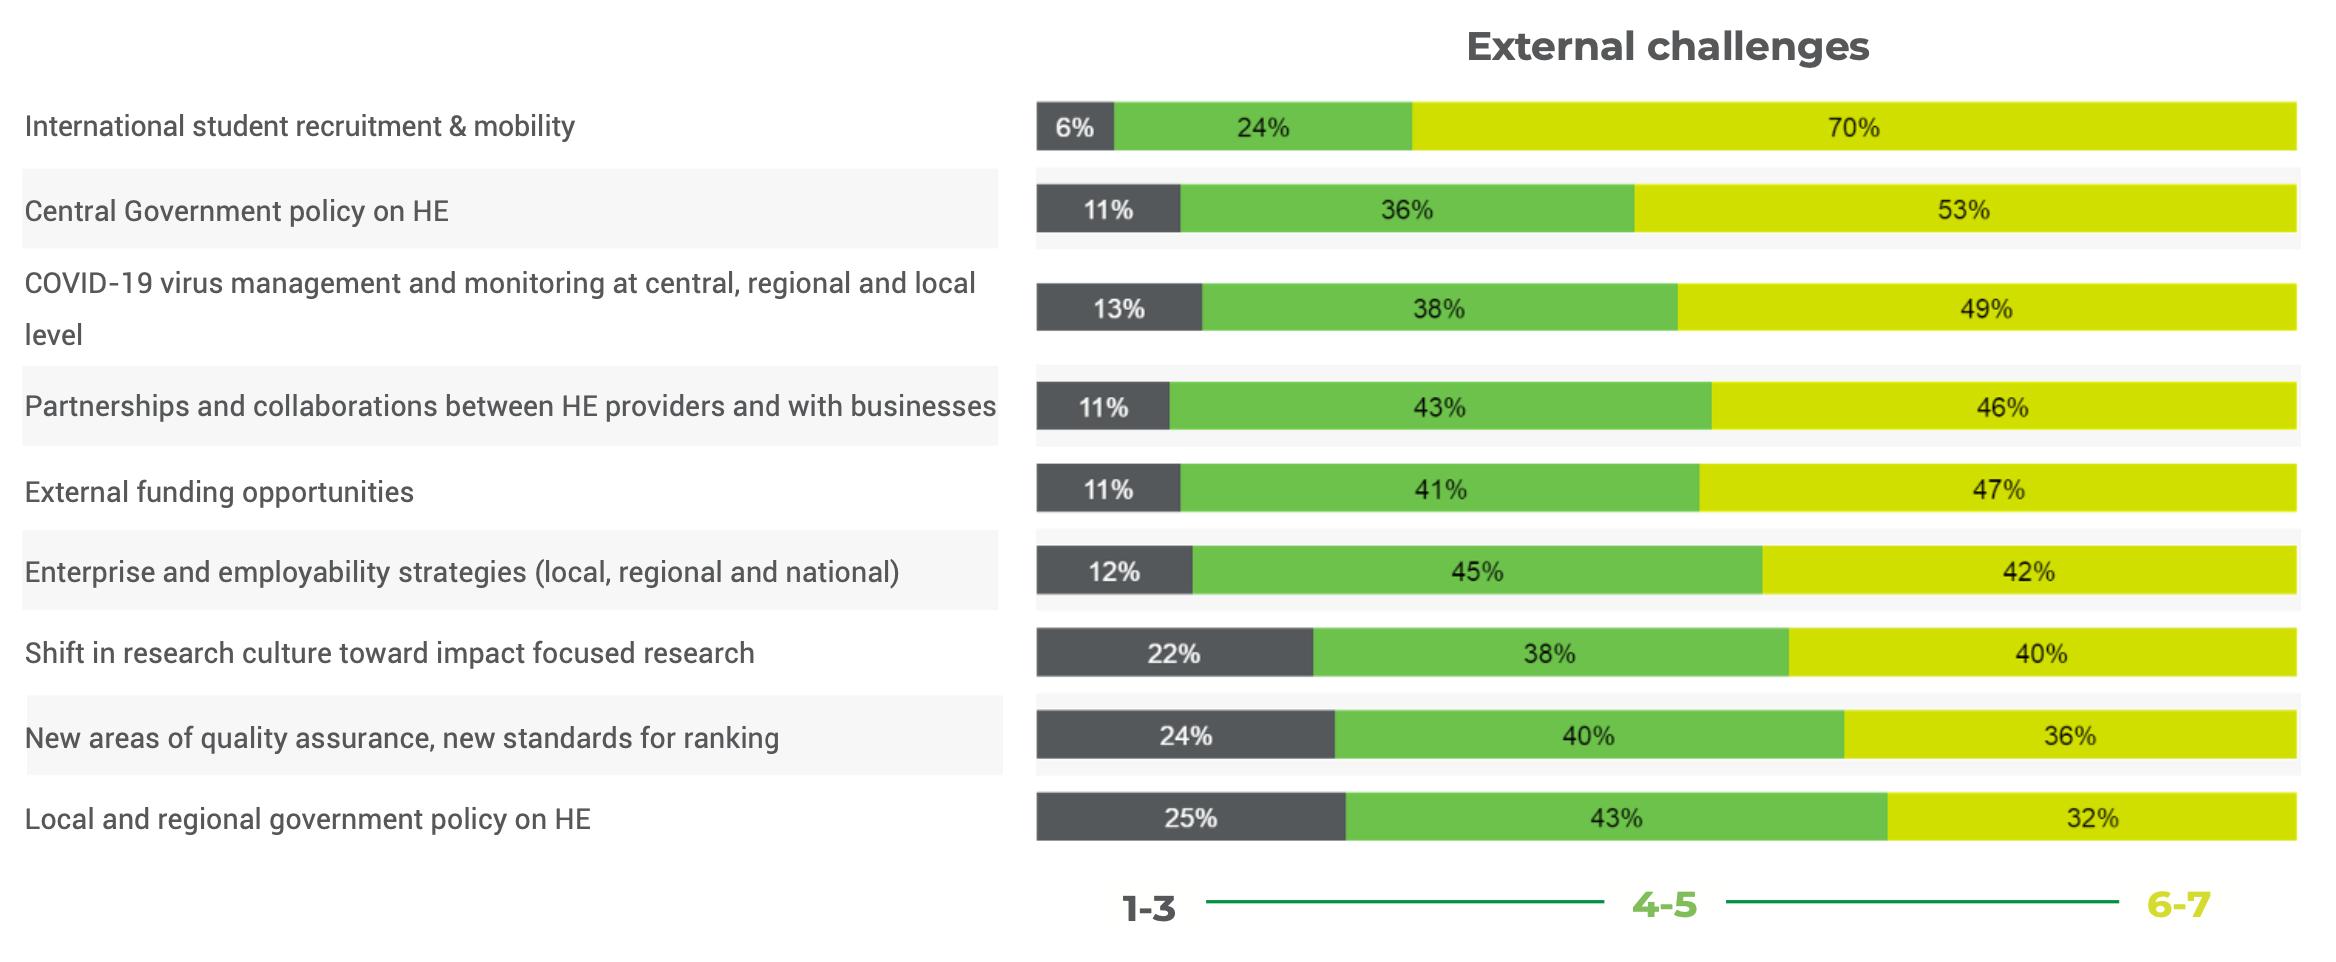 External challenges business schools impact